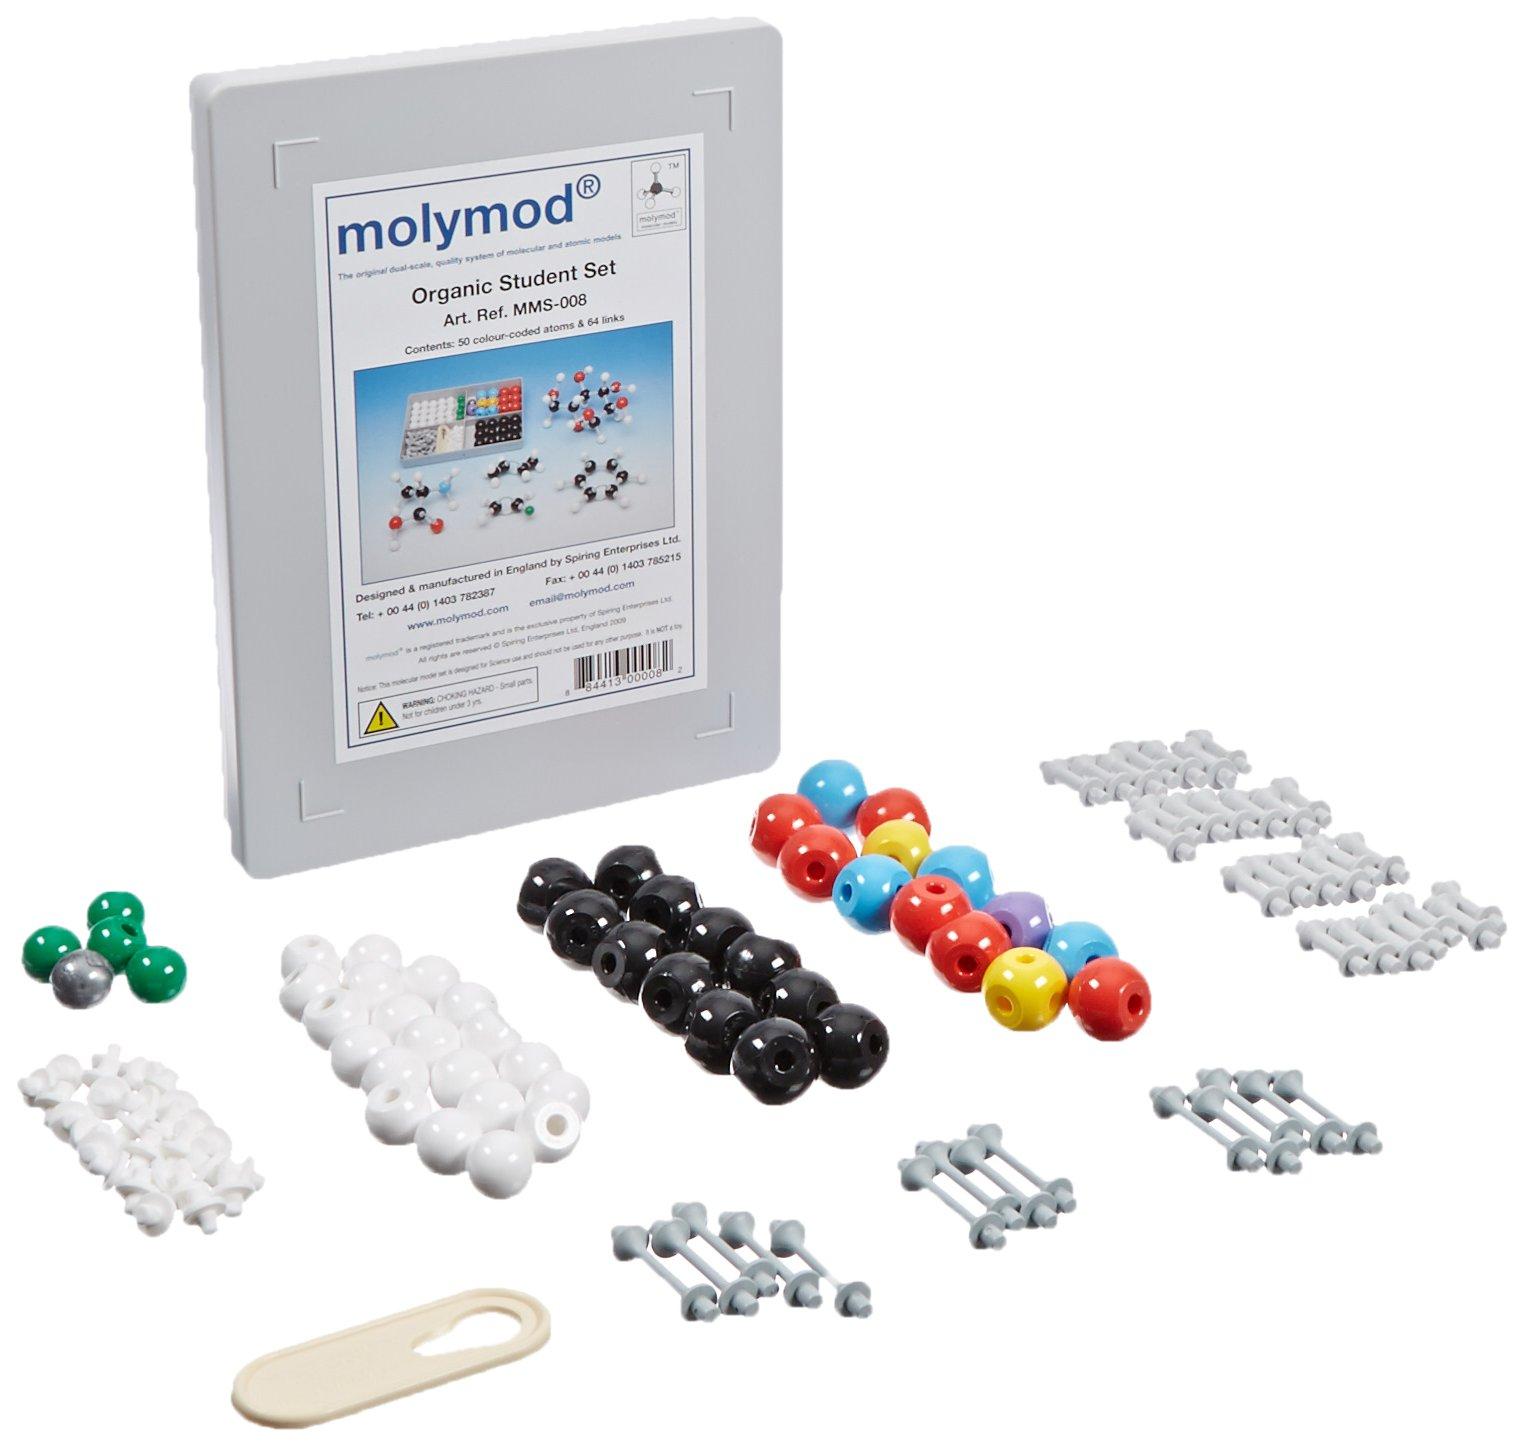 Molymod MMS-008 Organic Chemistry Molecular Model, Student Set (53 Atom Parts)